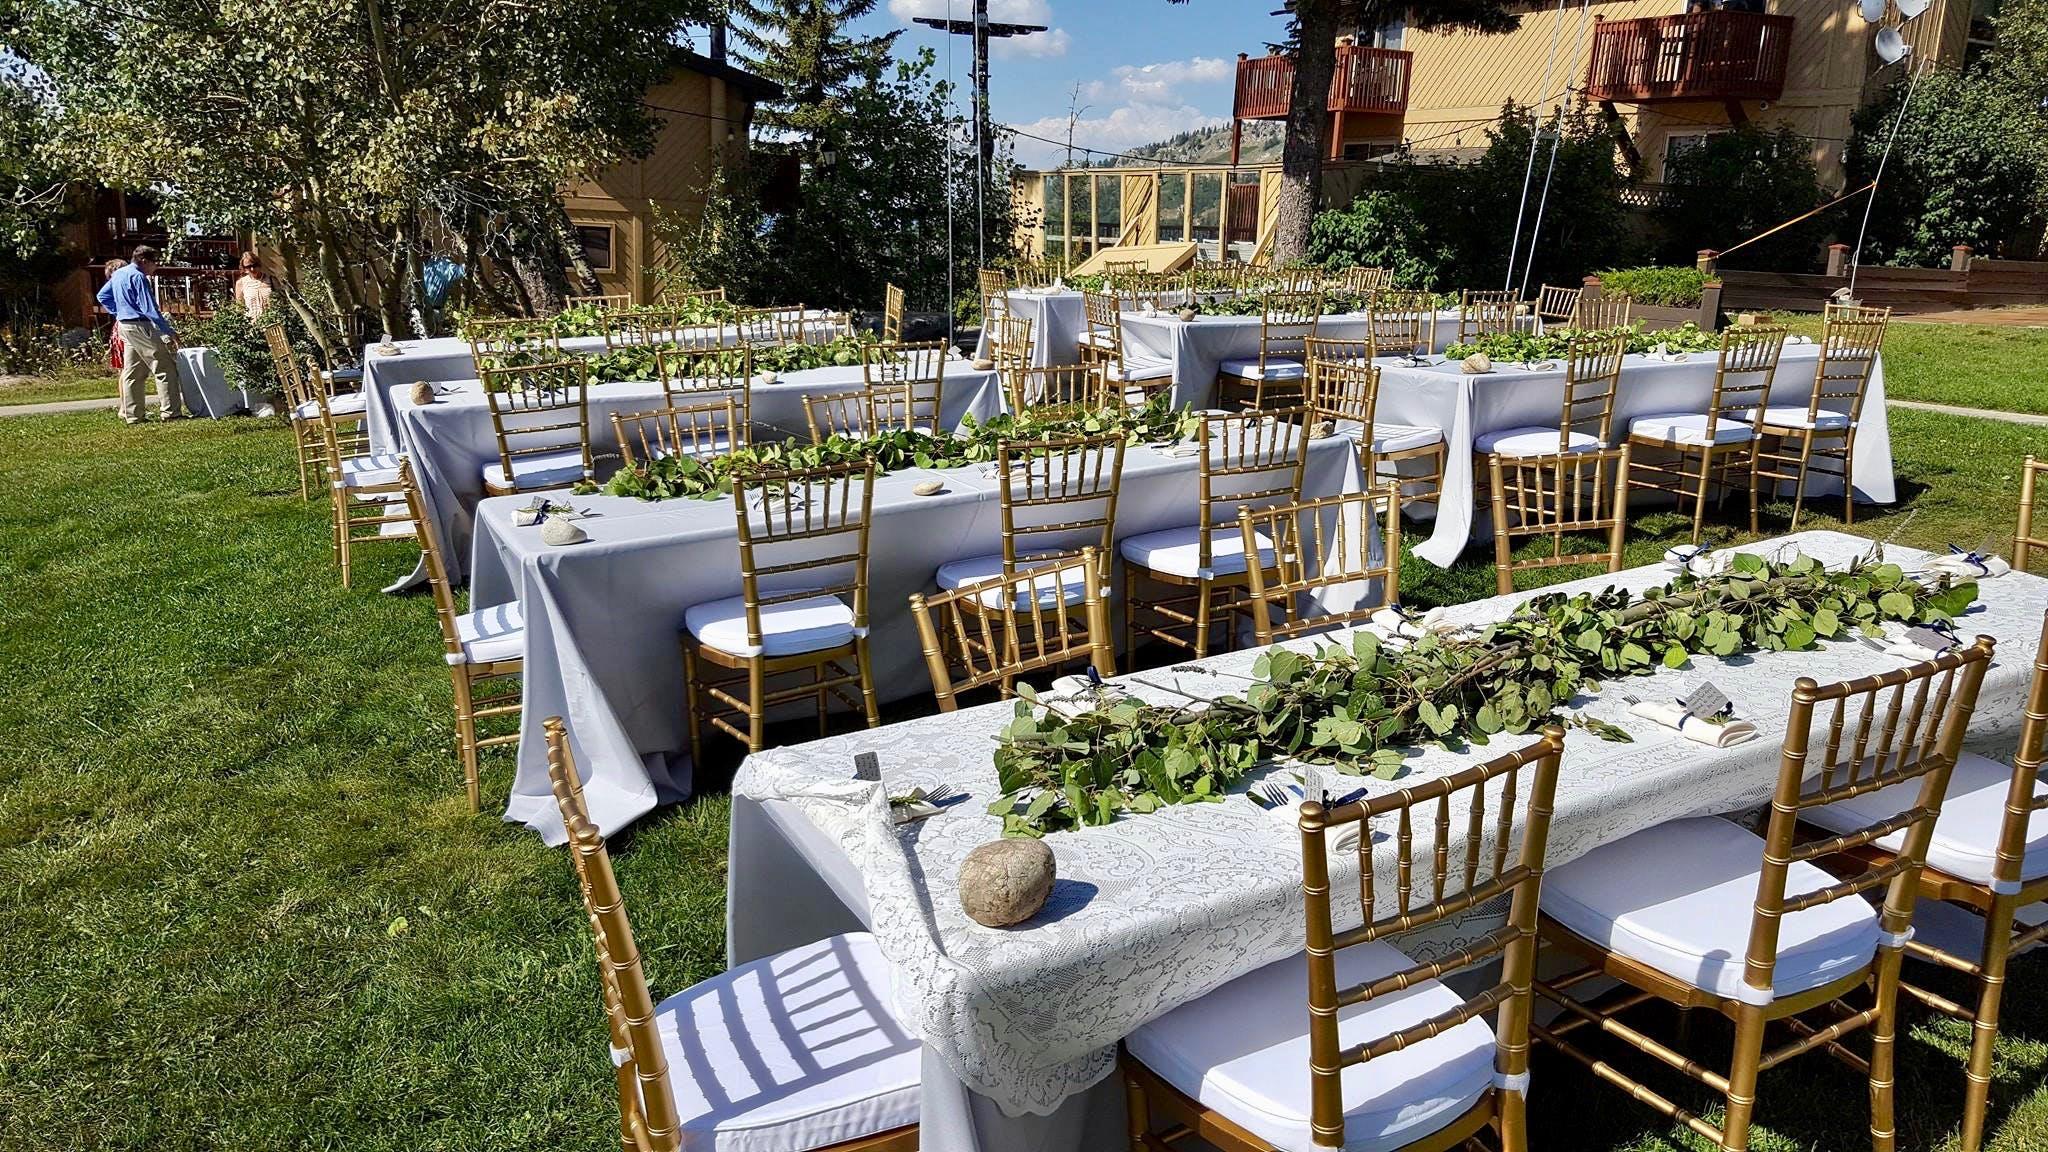 Dinner seating for a Bogus Basin wedding